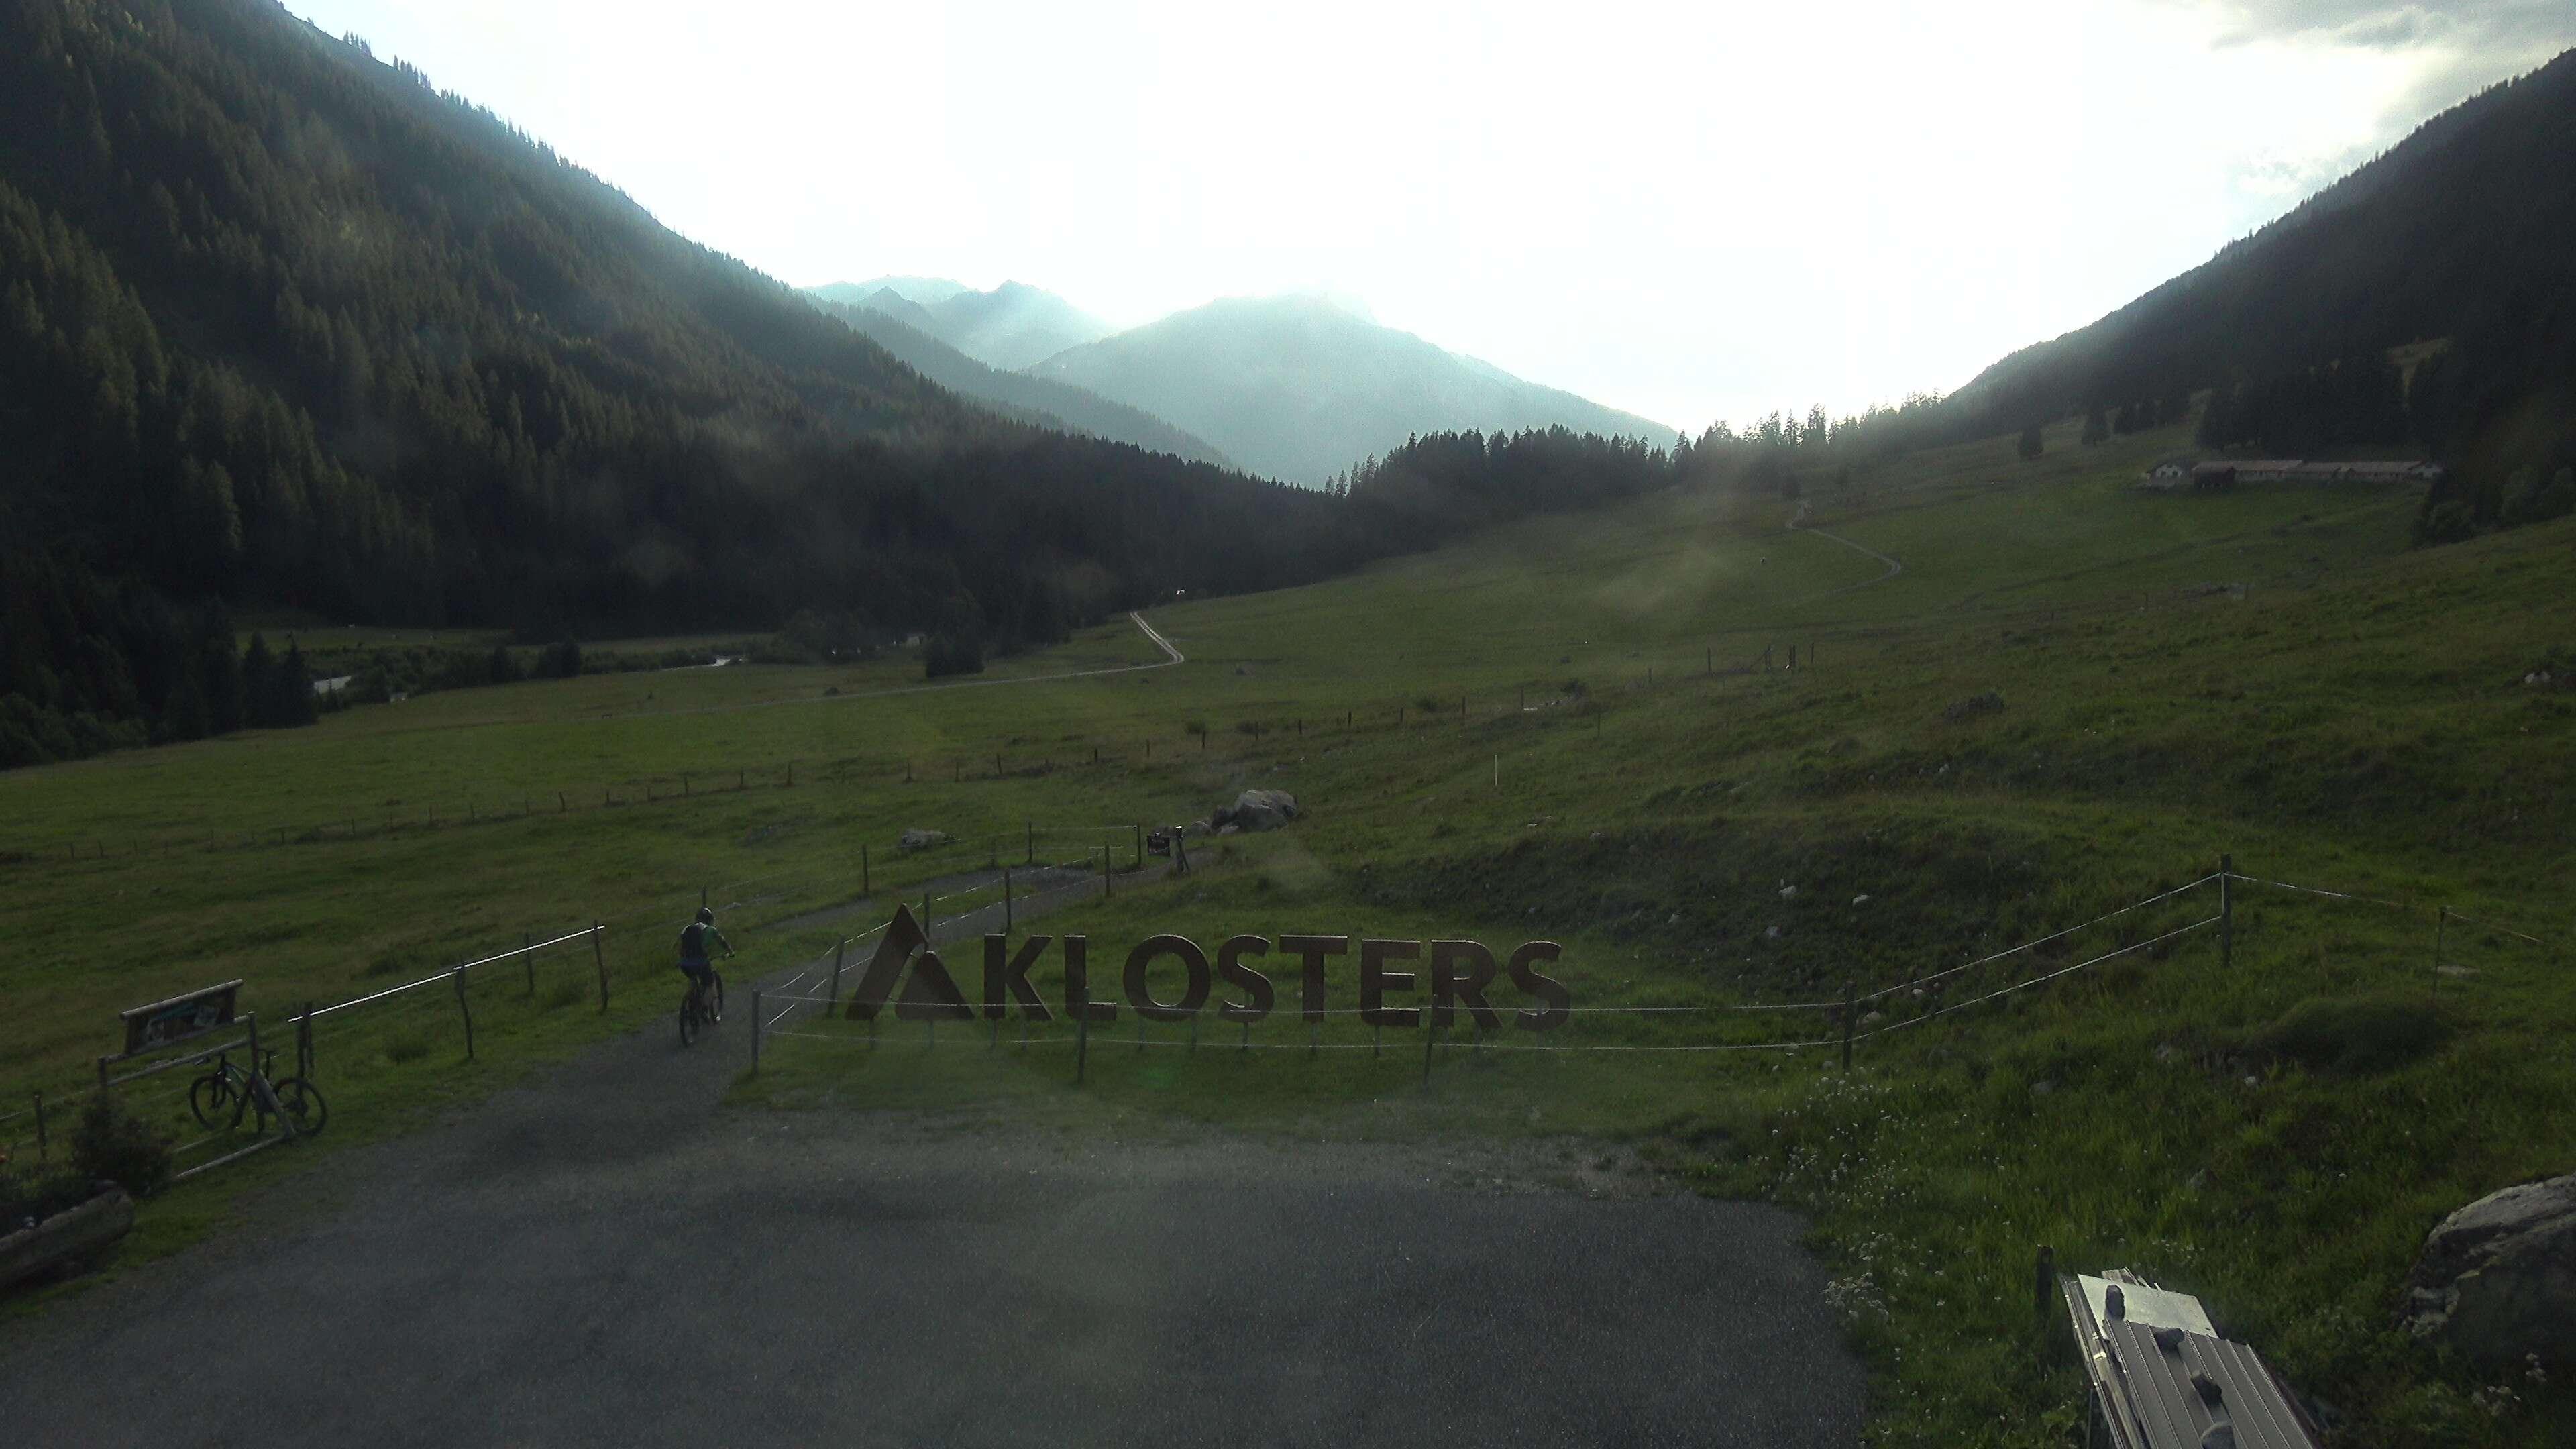 Klosters Garfiun